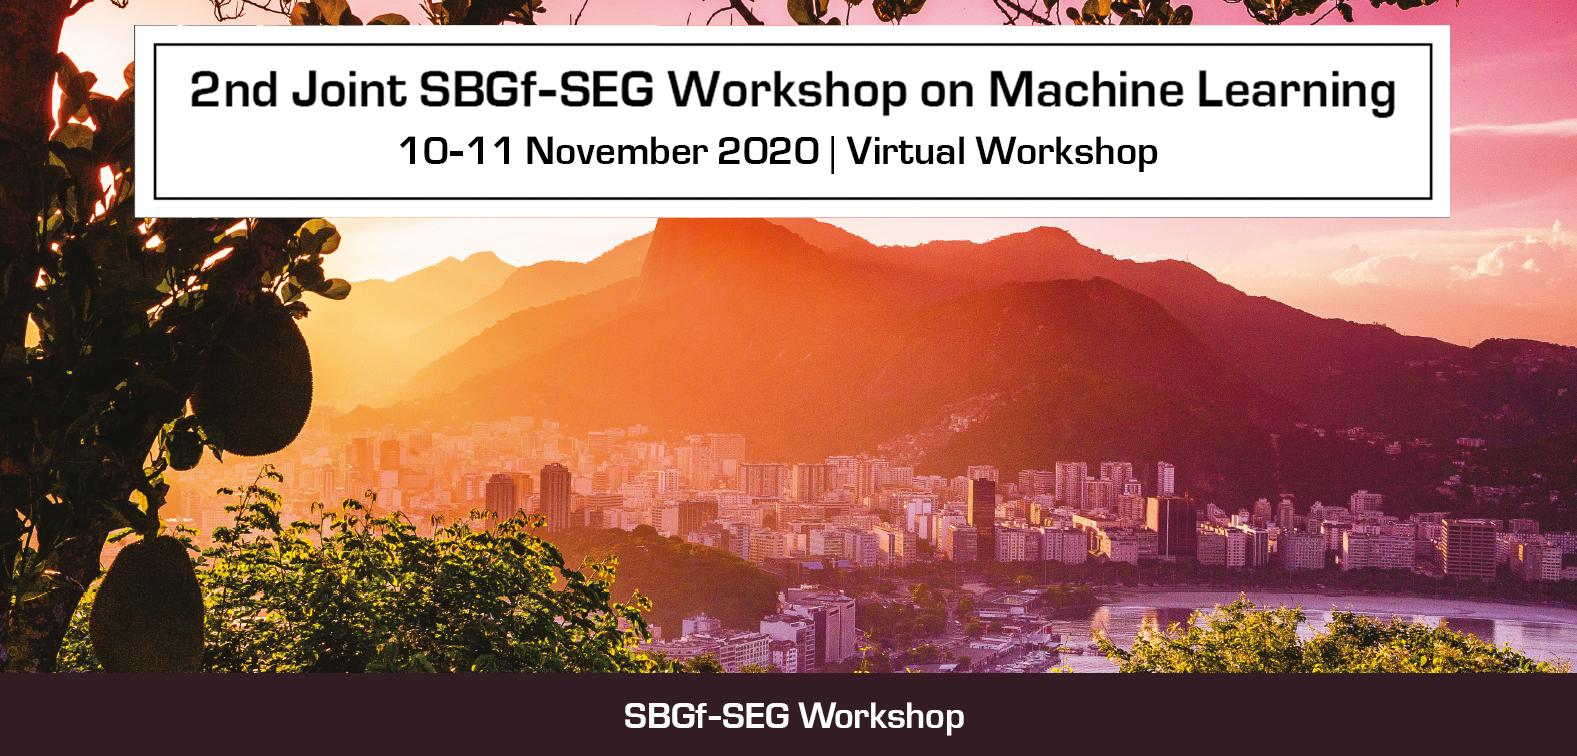 2nd SBGf-SEG Machine Learning Workshop